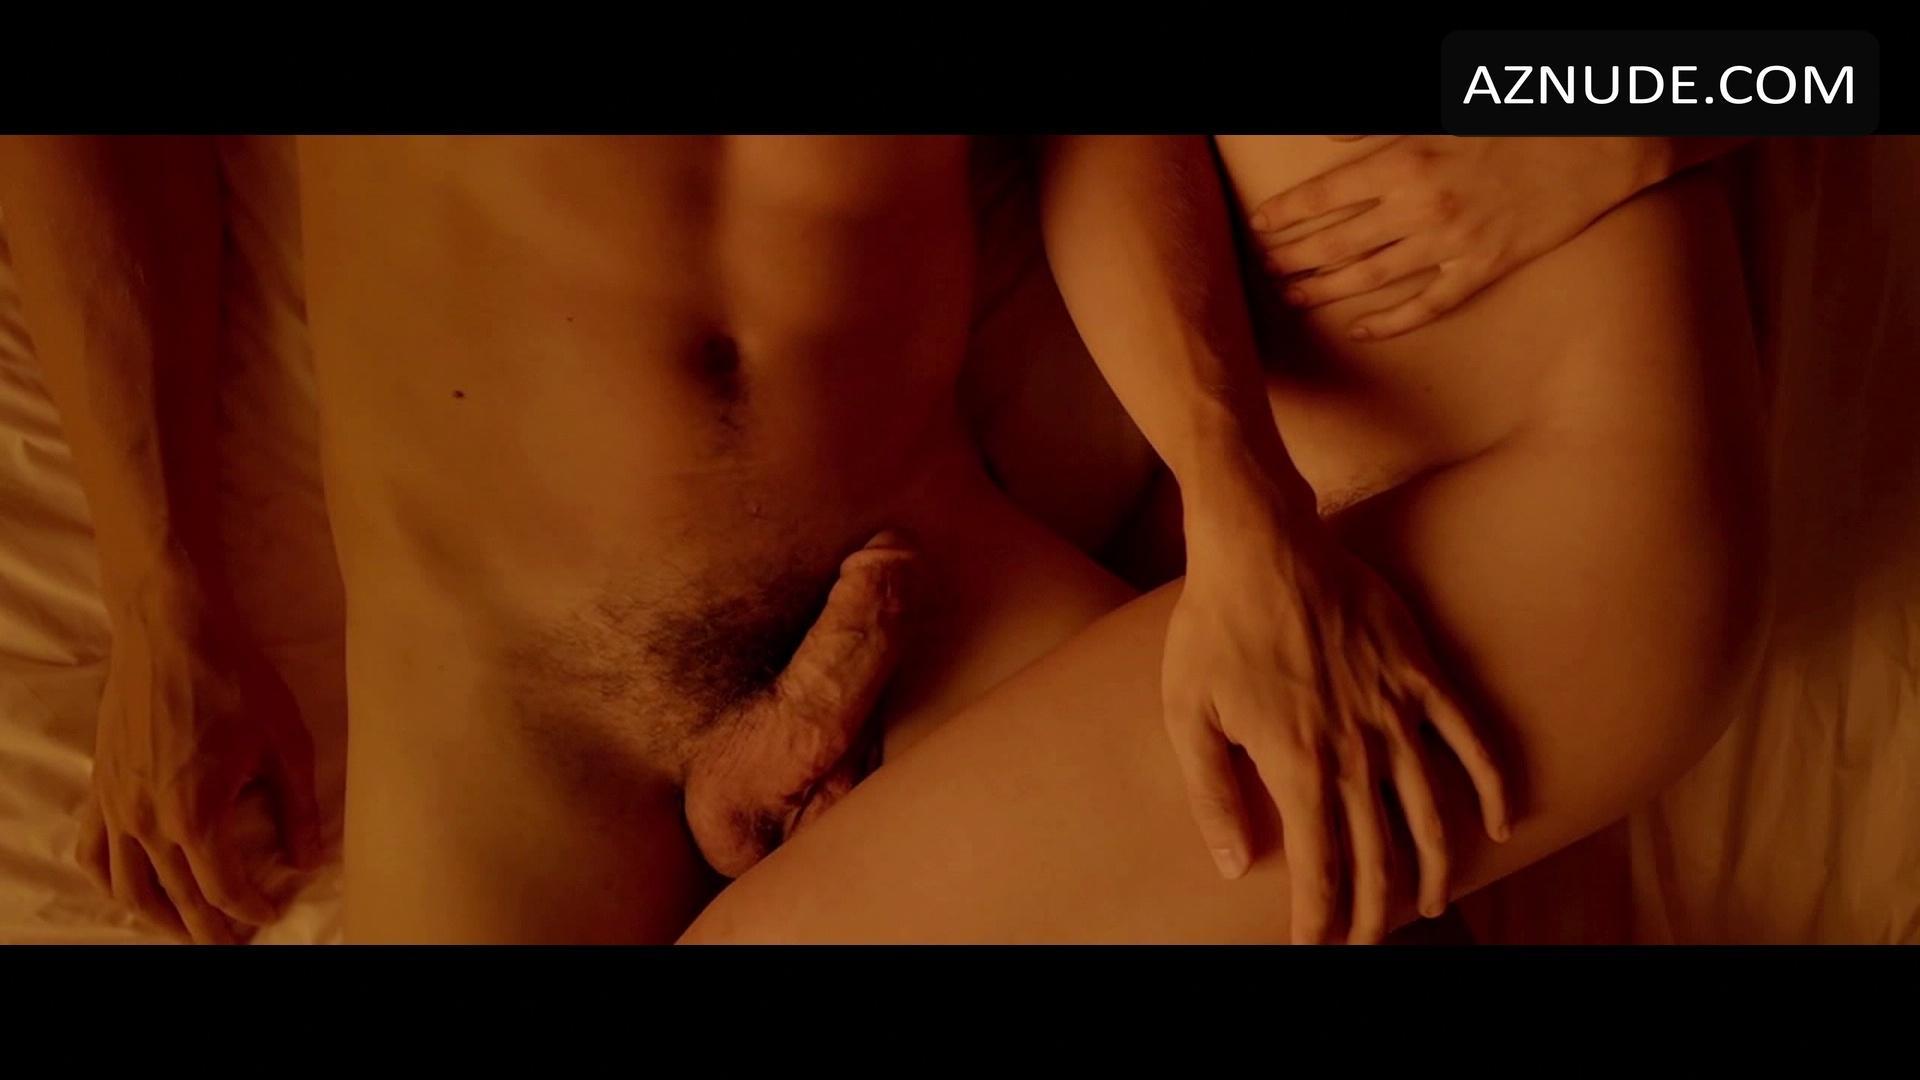 from Waylon naked gay men love videos